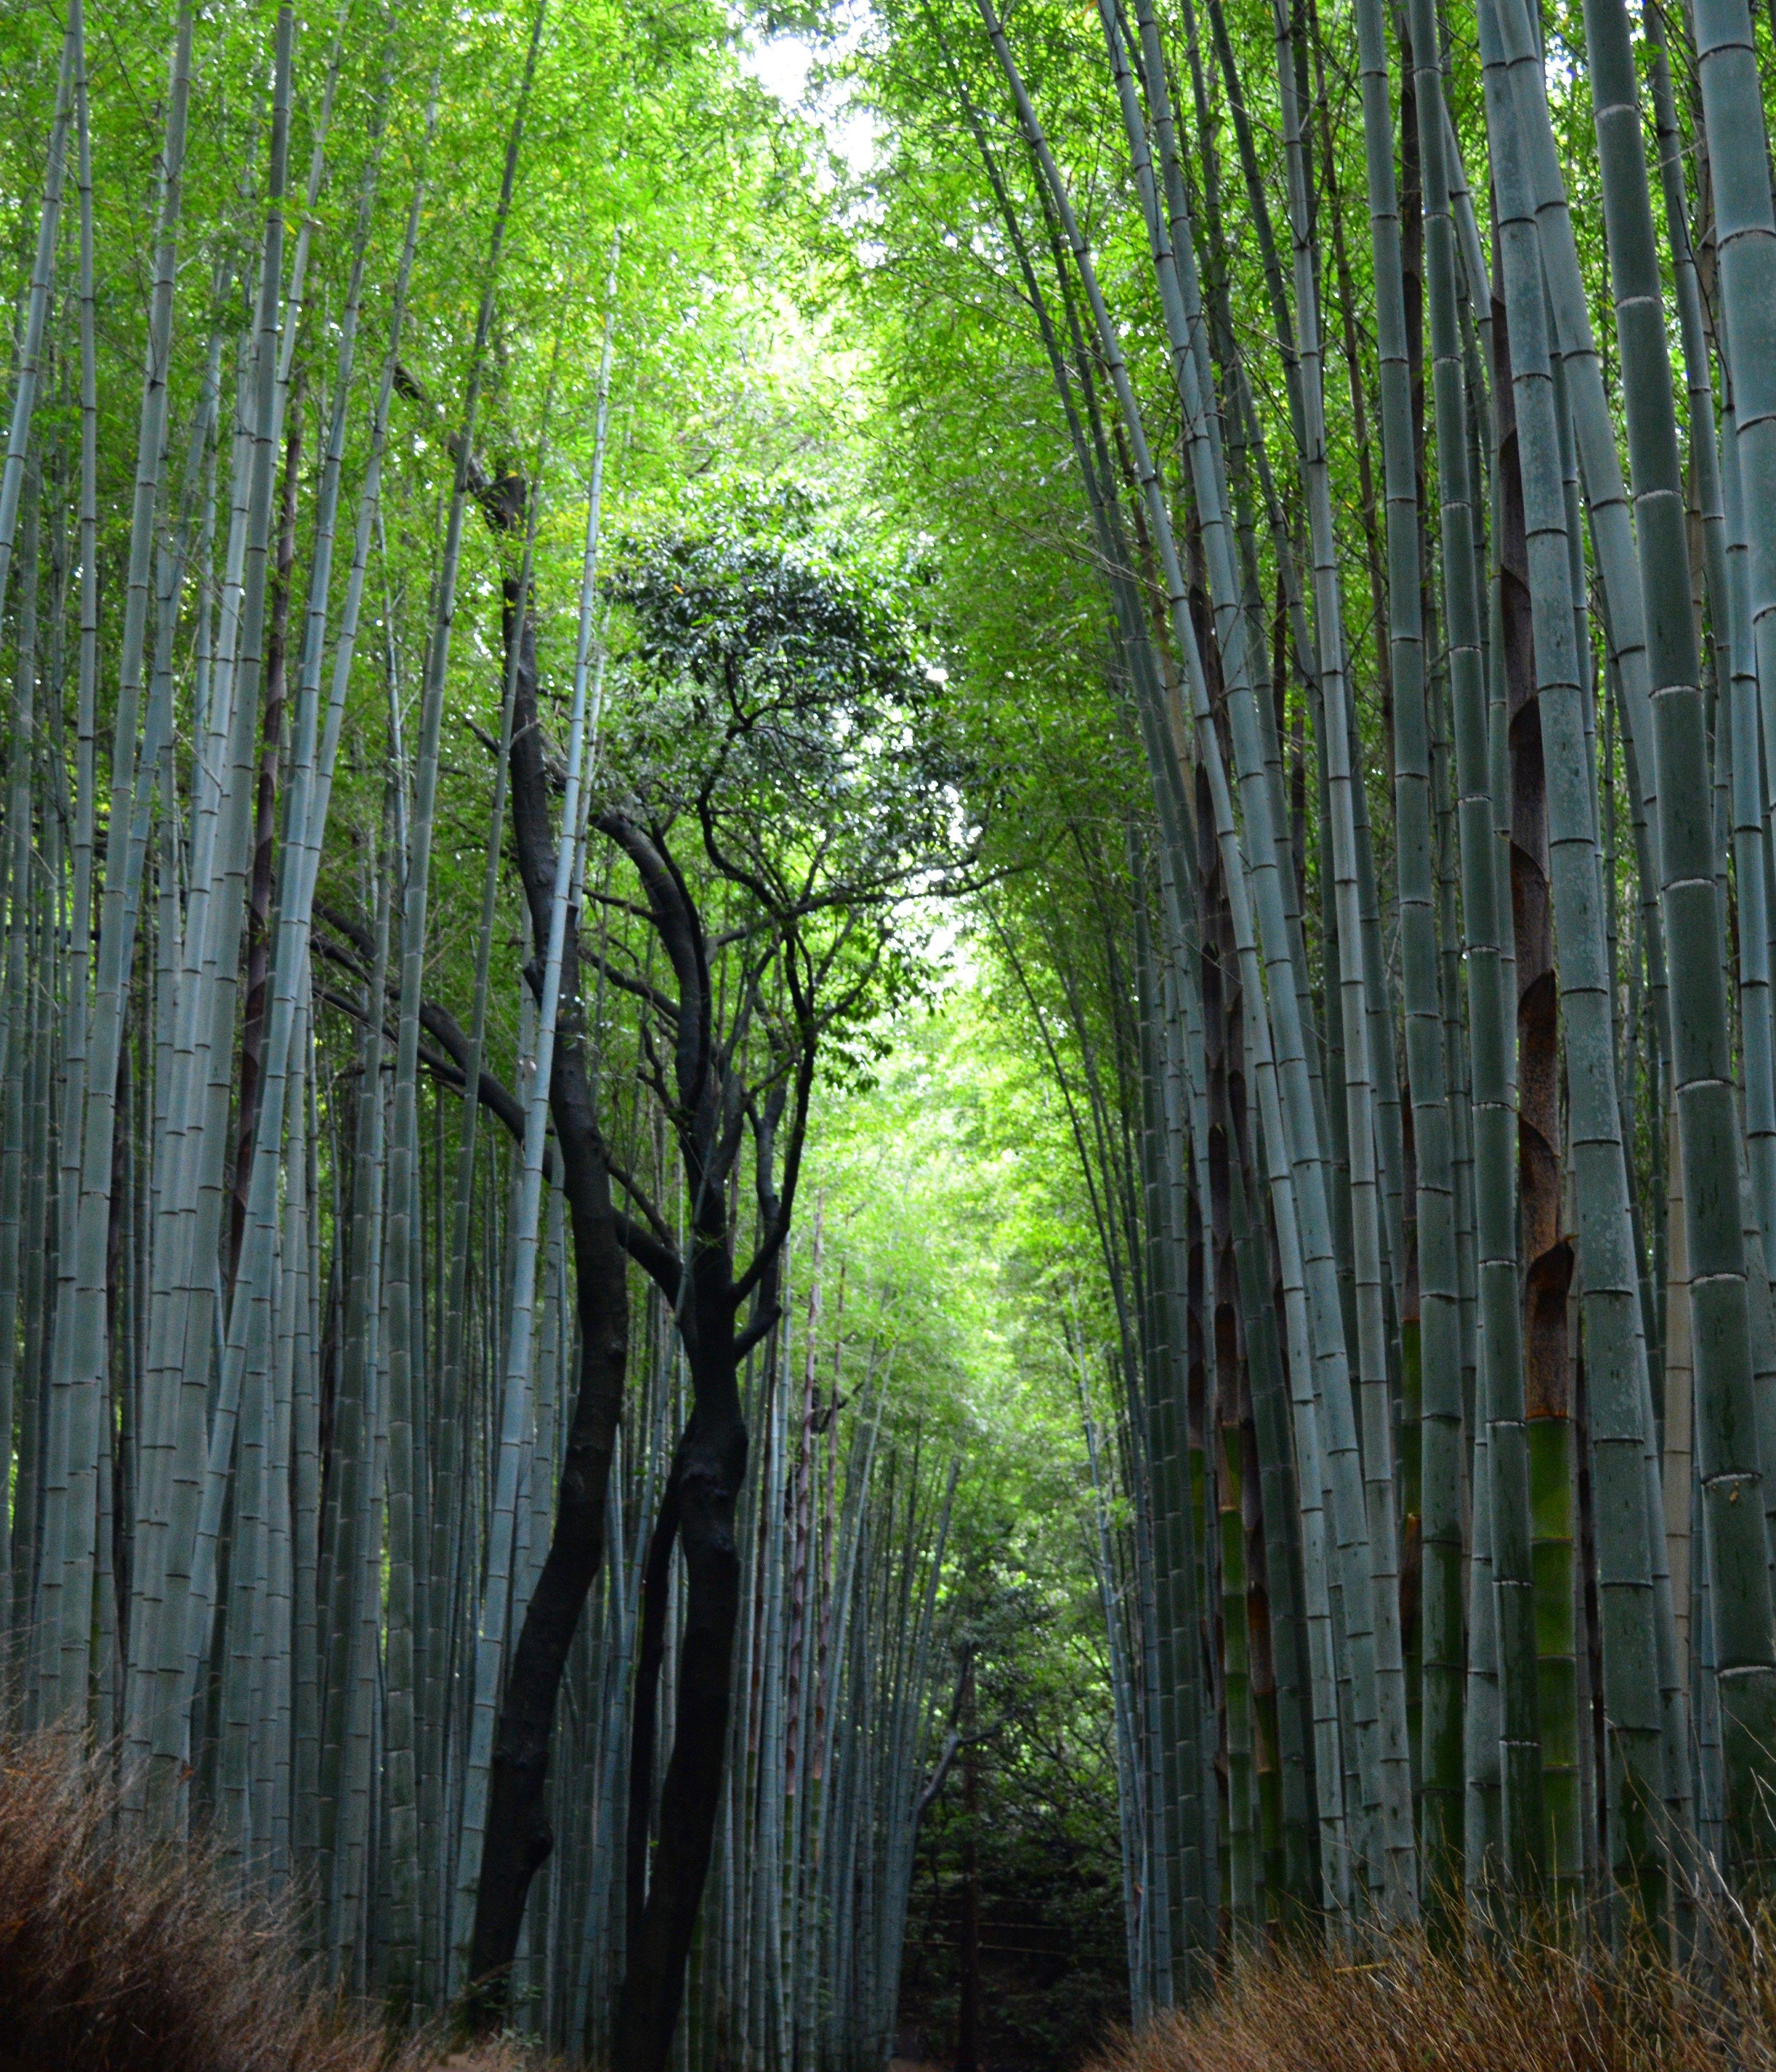 bamboozled – kyoto's arashiyama bamboo grove hd wallpaper from